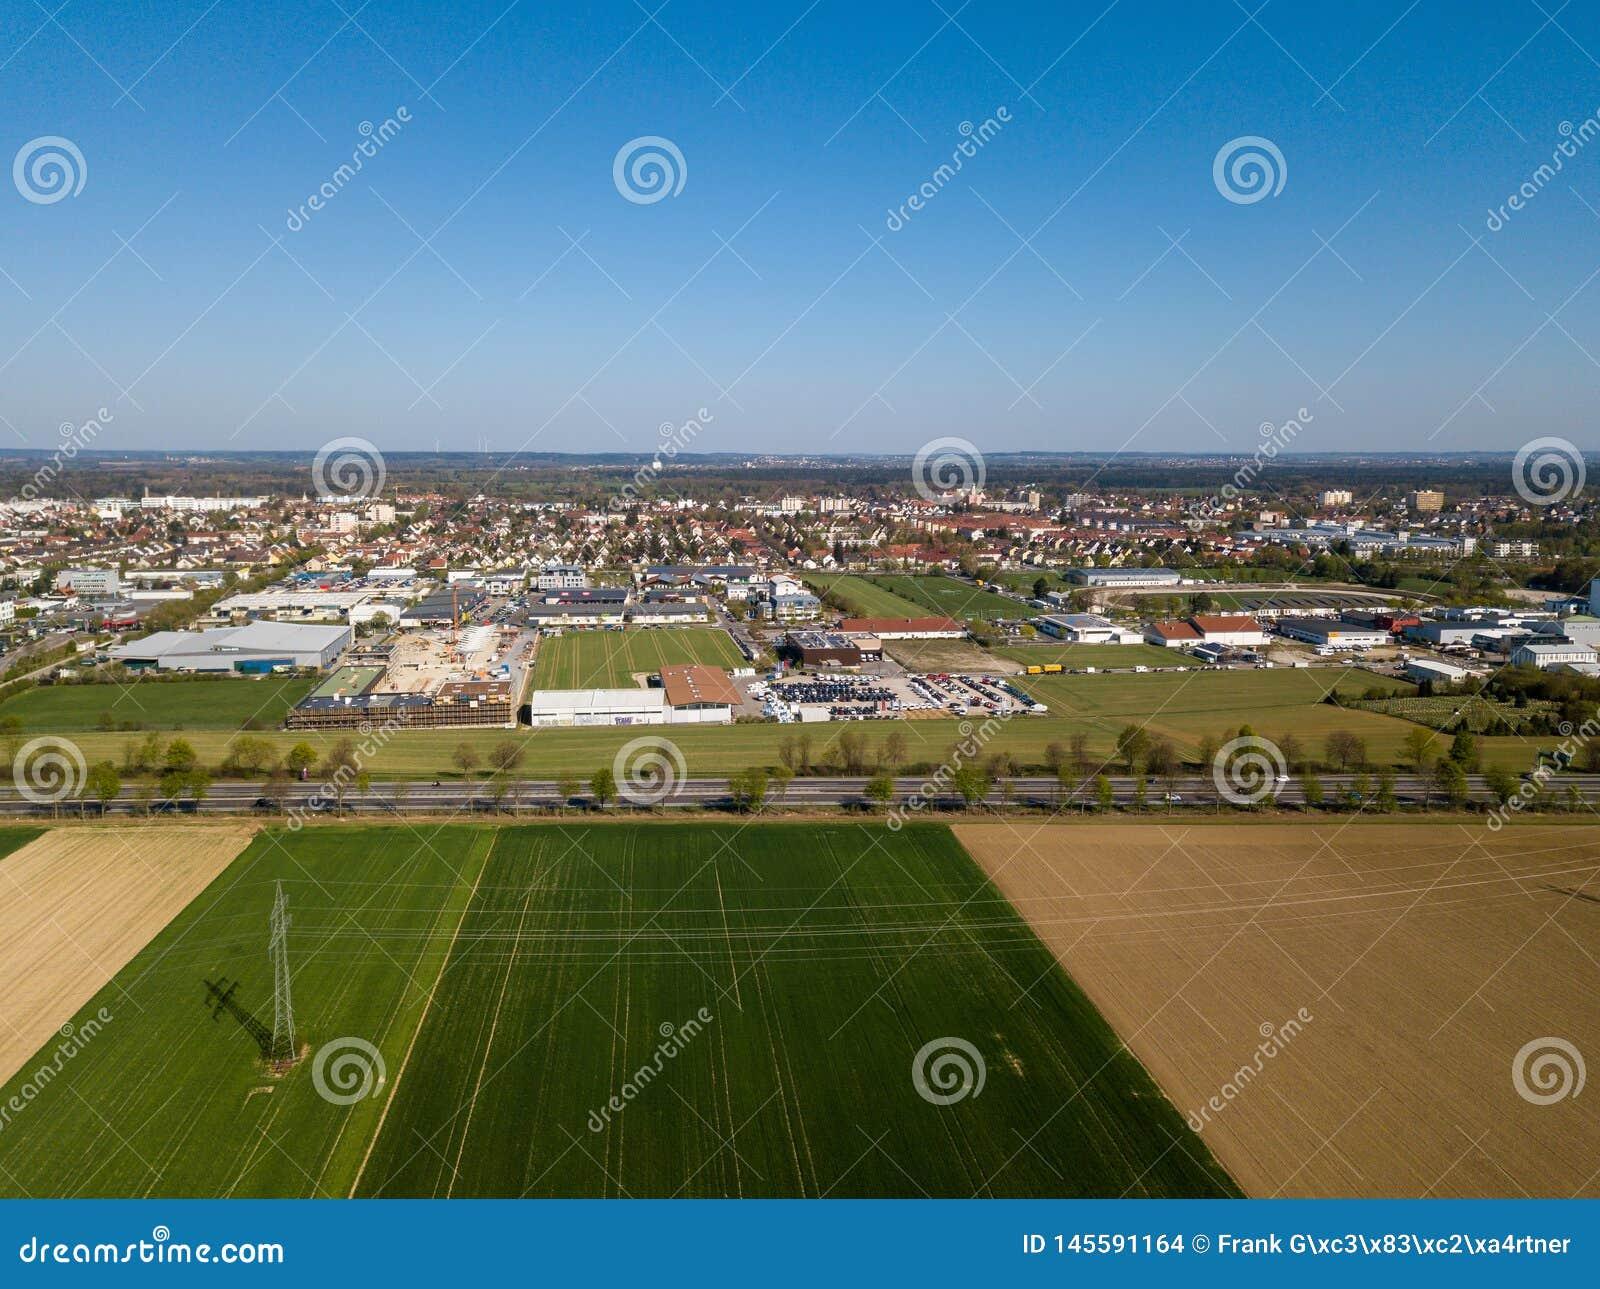 Haunstetten, a suburb of Augsburg in Germany